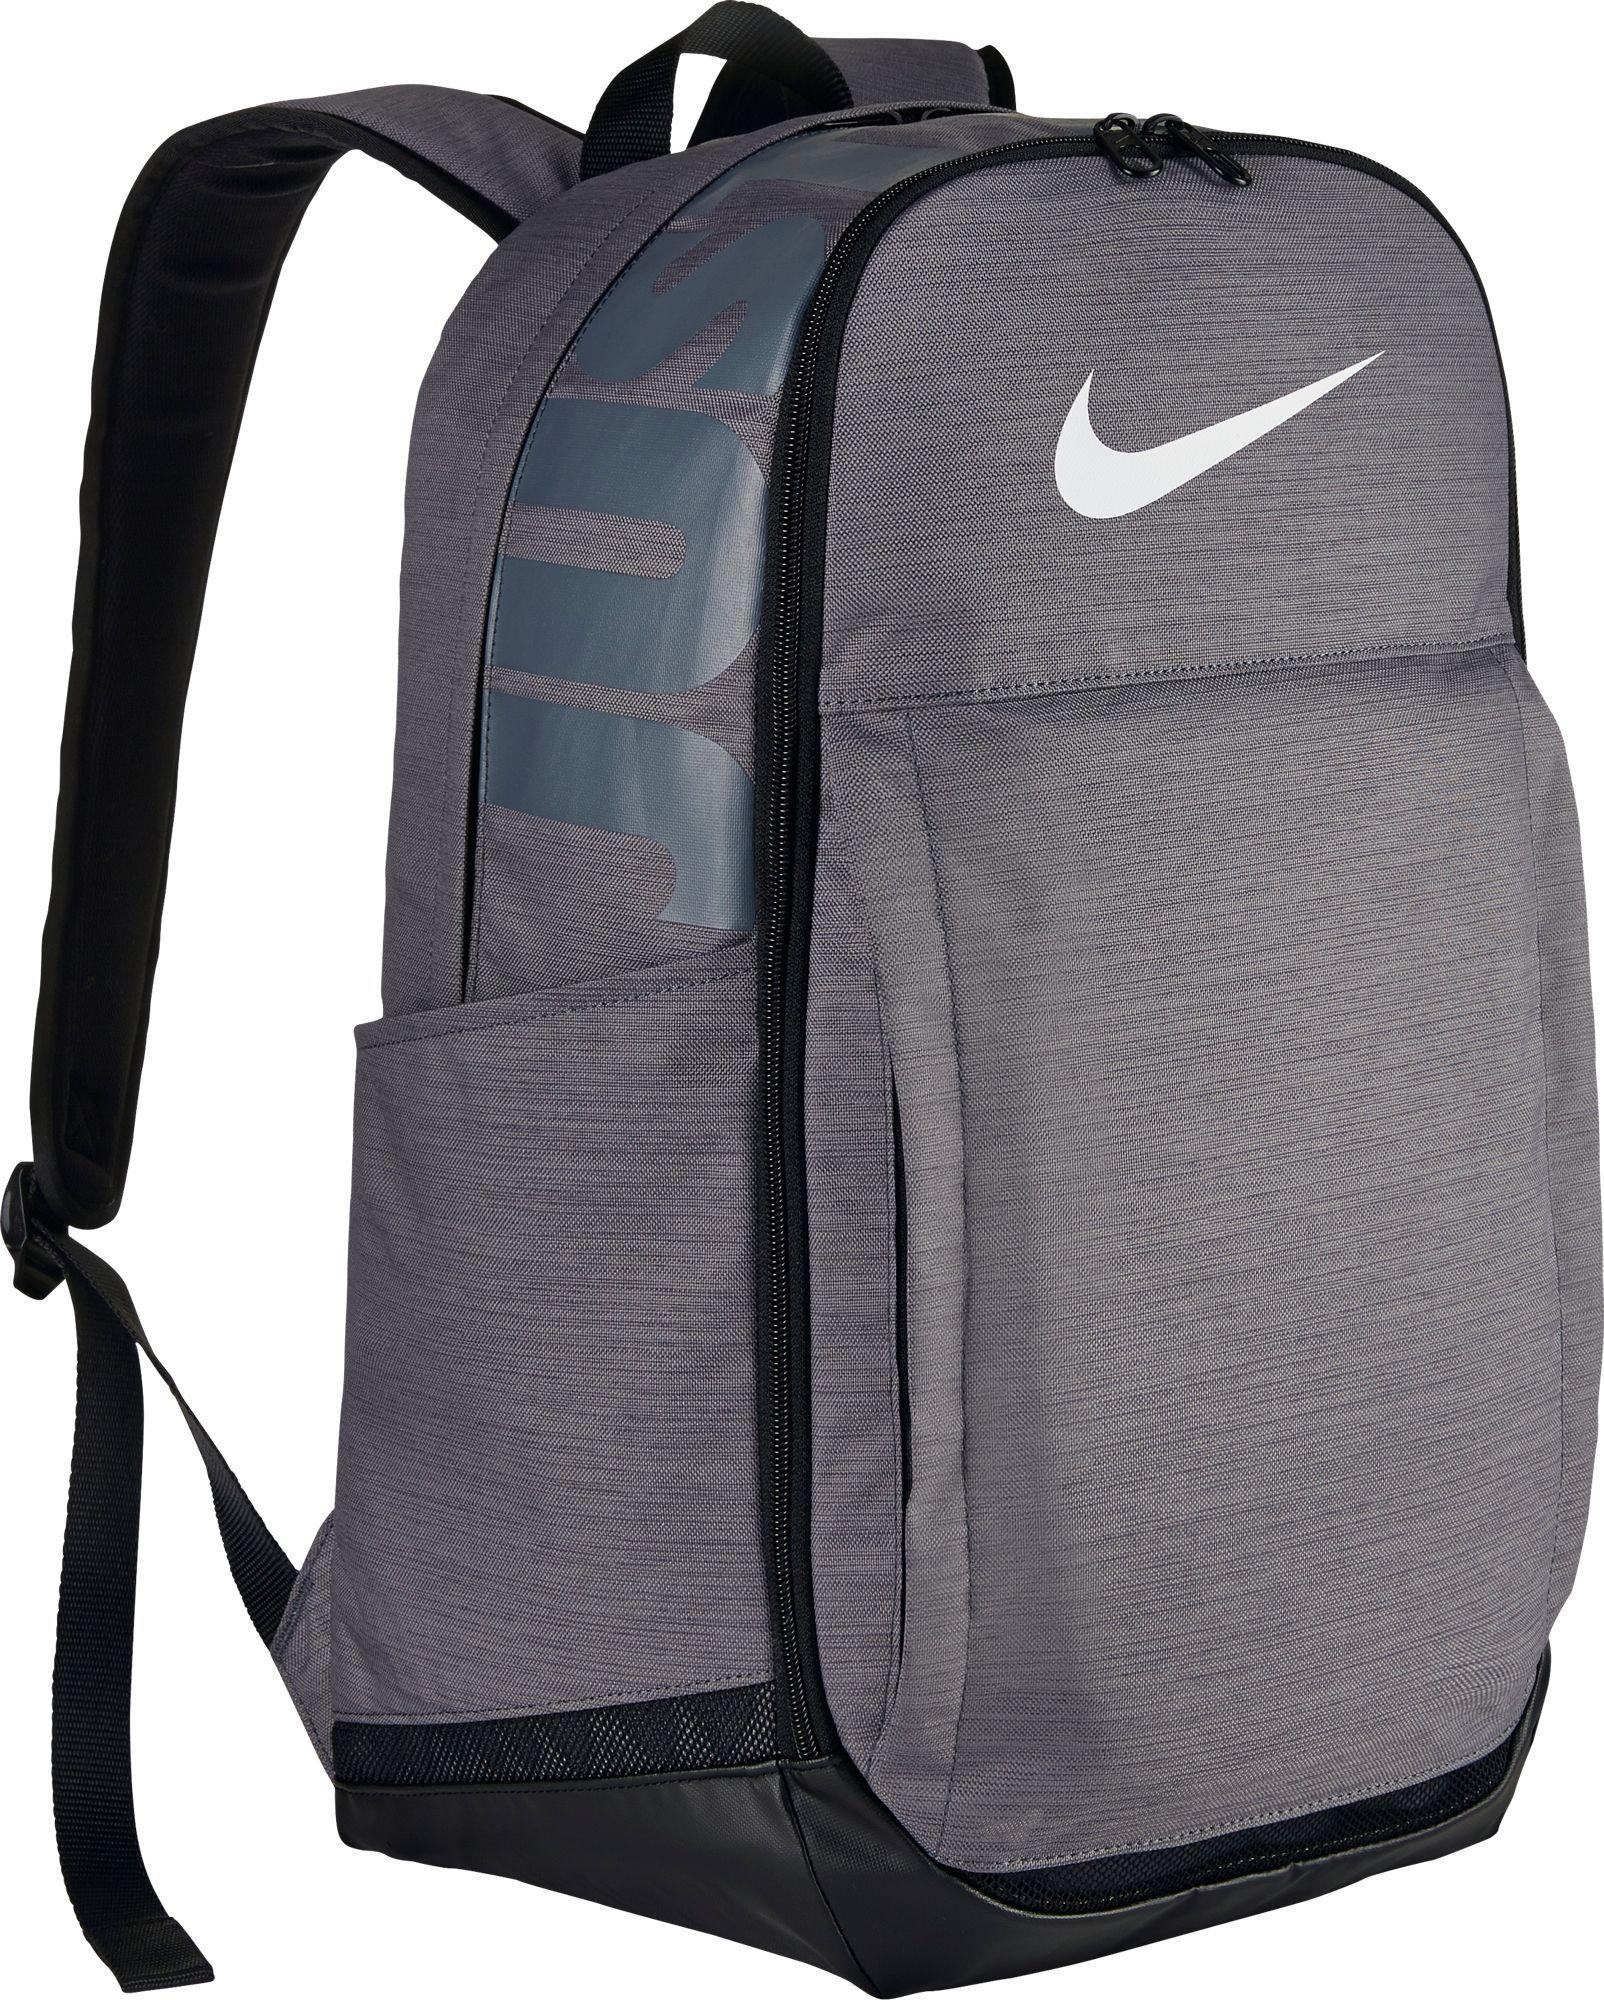 8c3817dd78 Nike Brasilia XL Training Backpack